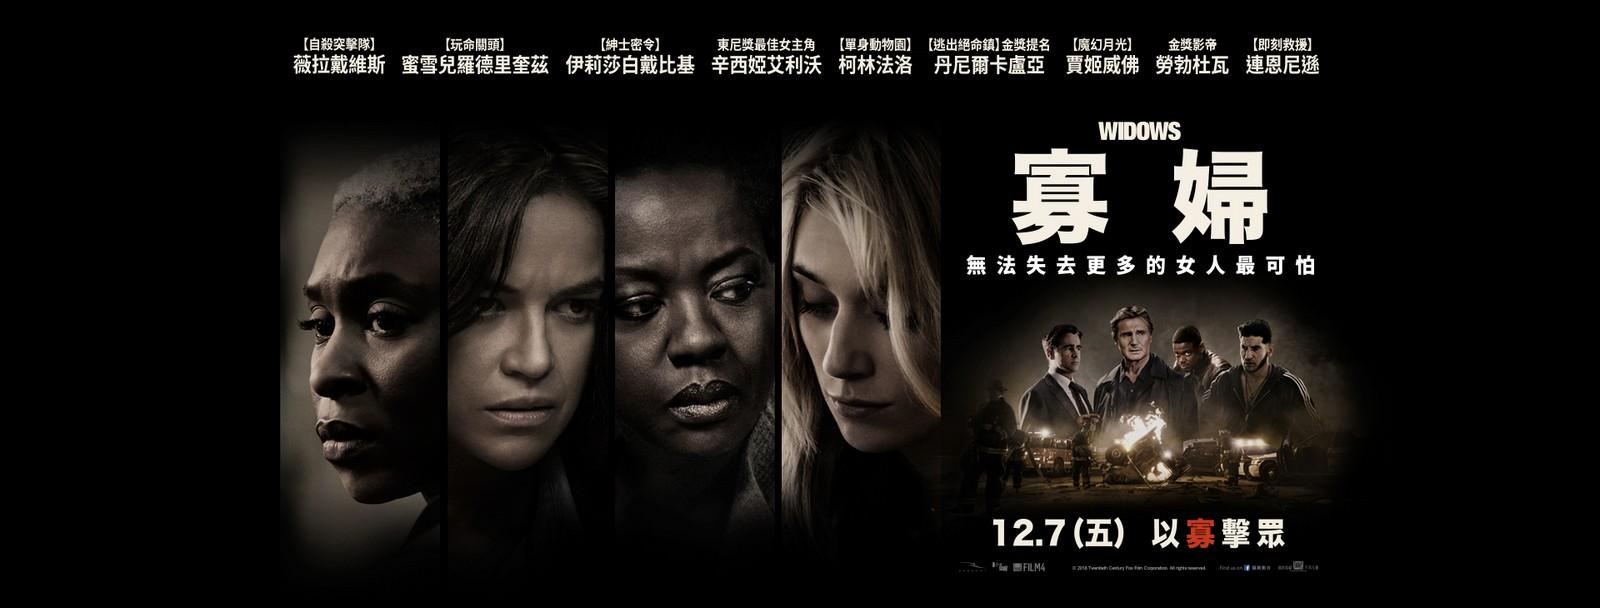 Movie, Widows(英國, 2018年) / 寡婦(台灣) / 寡妇联盟(網路), 電影海報, 台灣, 橫版